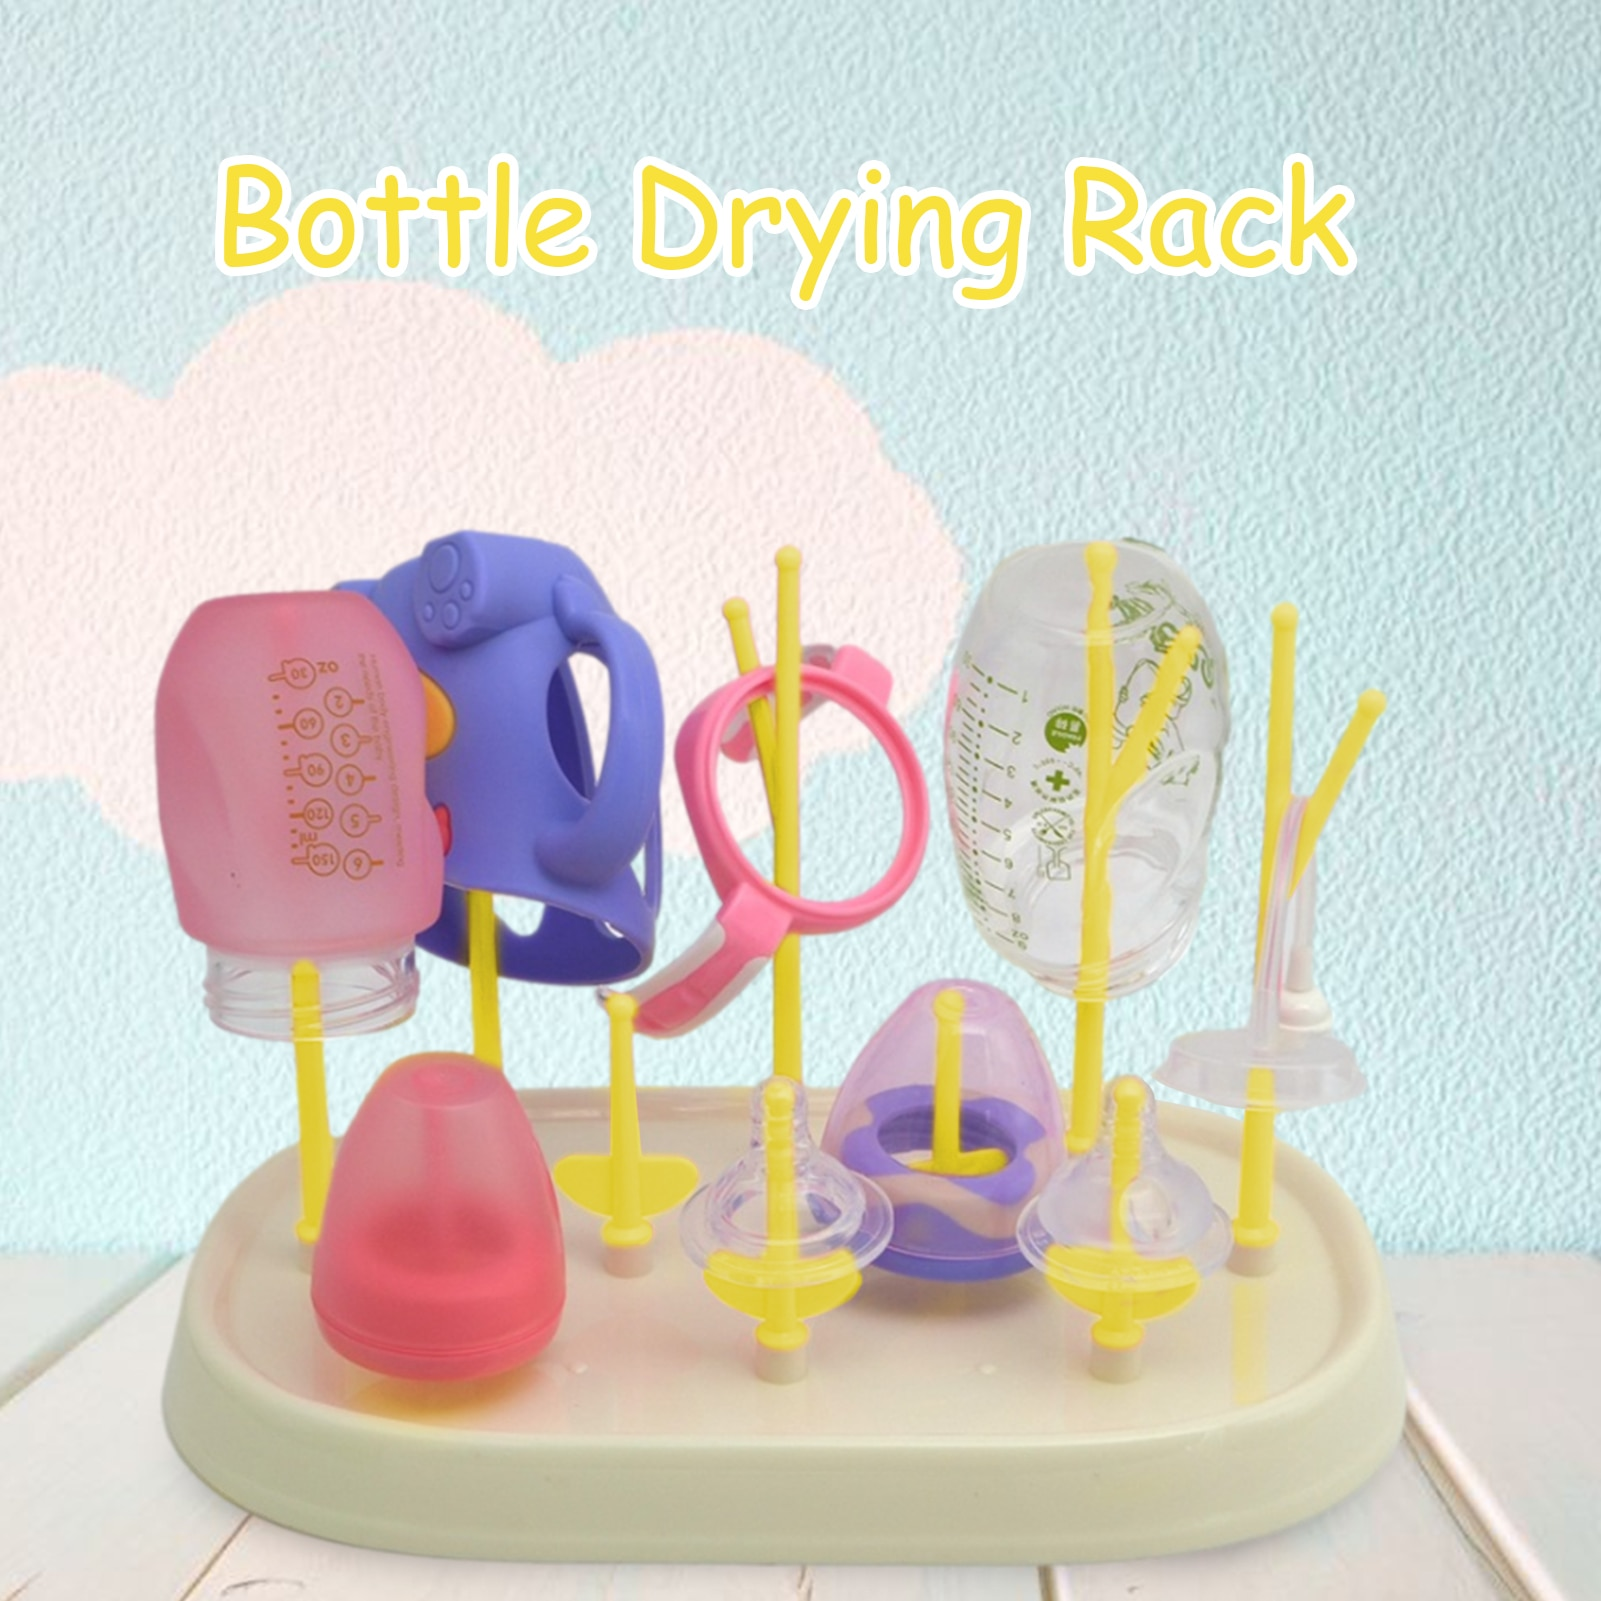 Plastic Baby Bottle Drying Rack Baby Bottle Cleaning Dryer Drainer Storage Rack Tree Shape Rack For Babies Bottles Removable